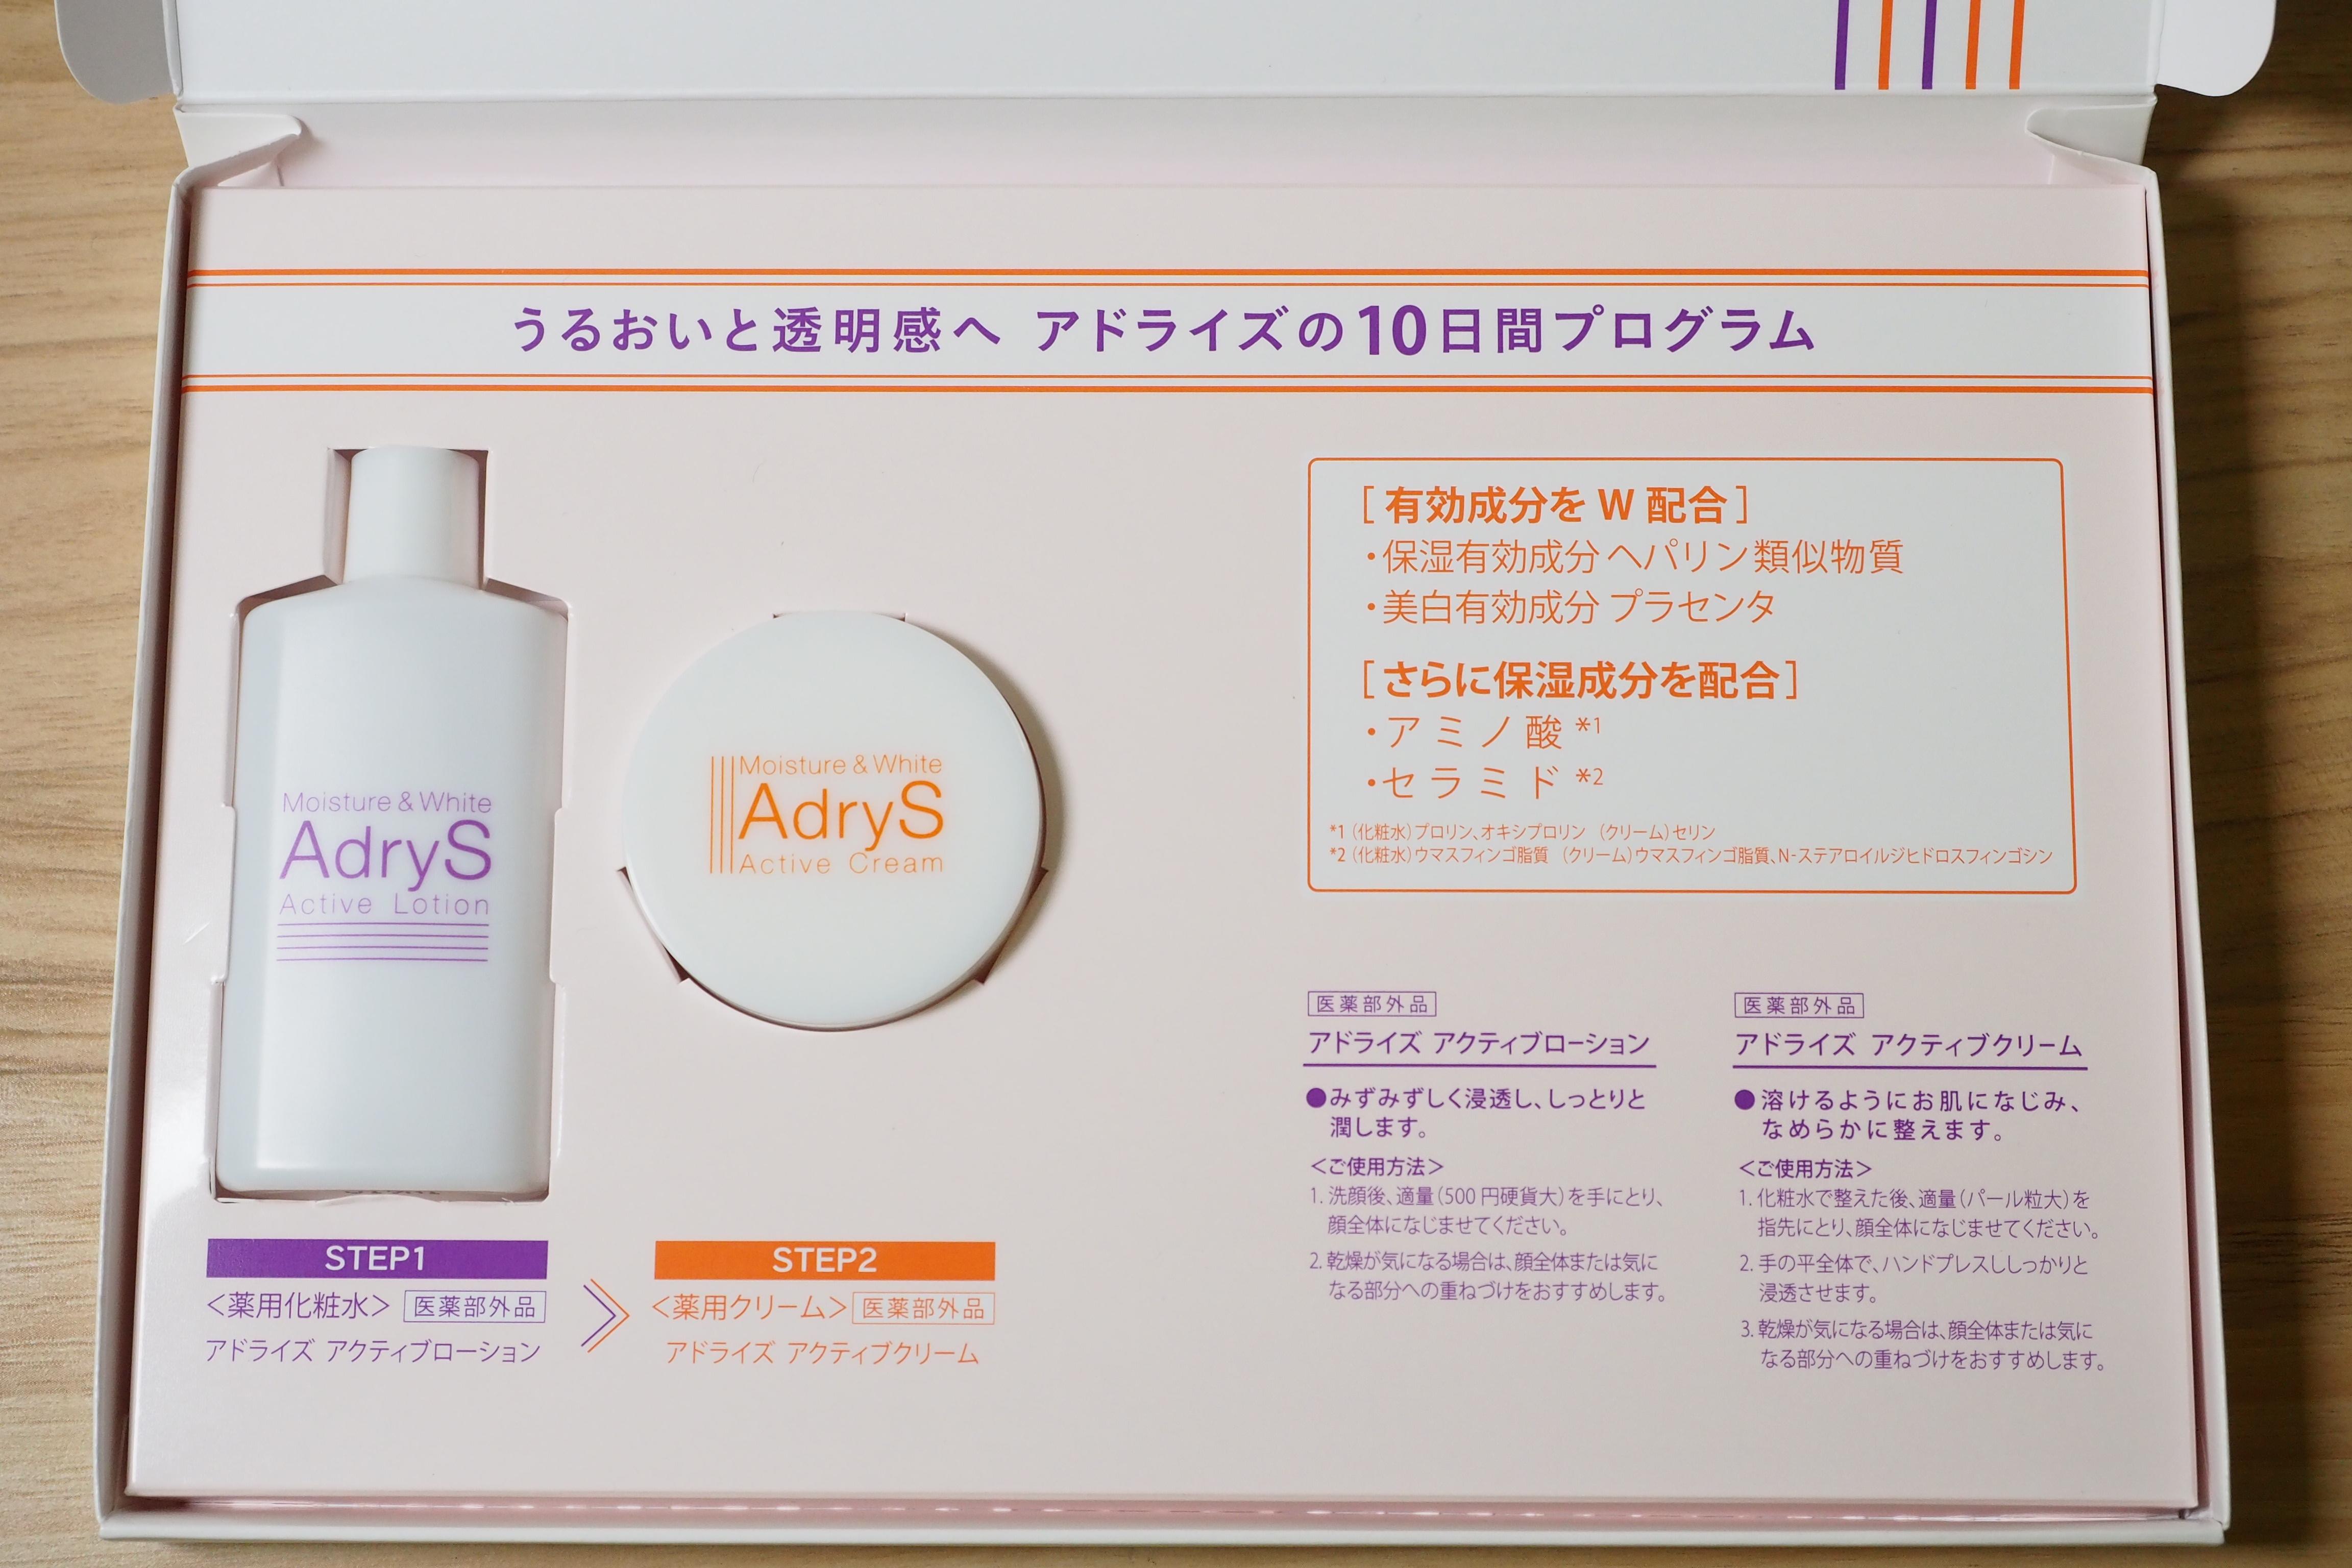 Adrys(アドライズ)化粧水とクリームの効果を徹底調査!成分解析と口コミ評価から美白&保湿の実力を検証! アイキャッチ画像